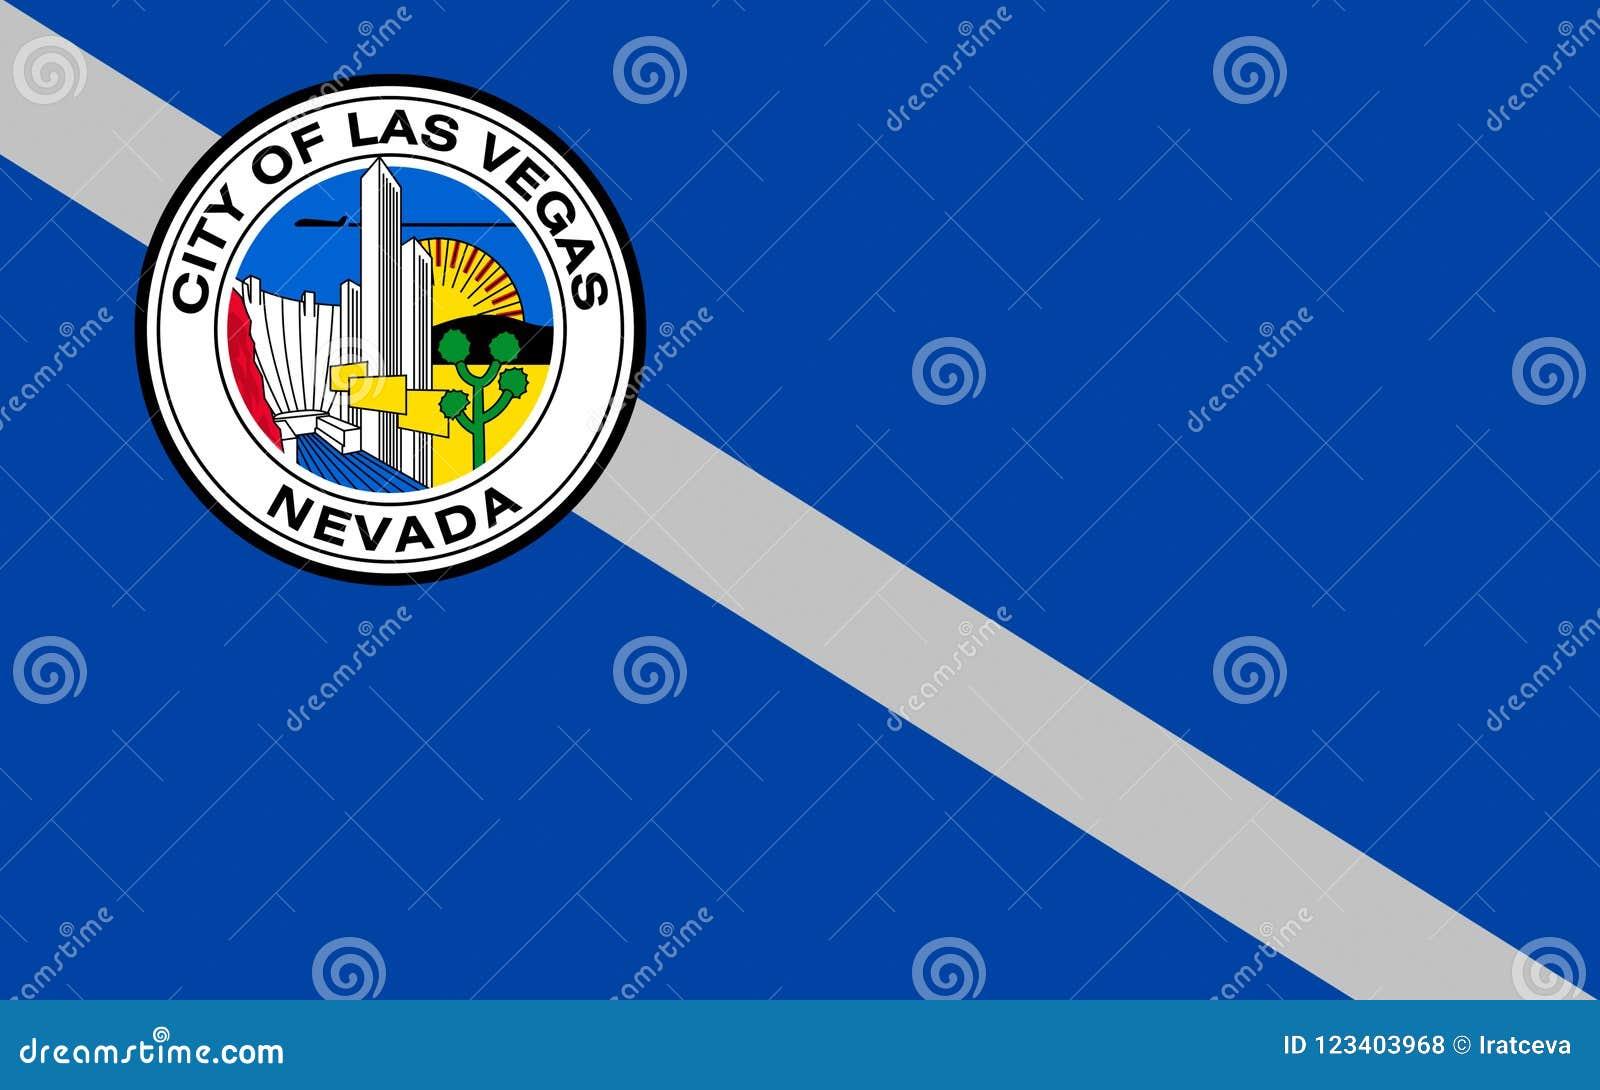 Flagge von Las Vegas in Nevada, USA